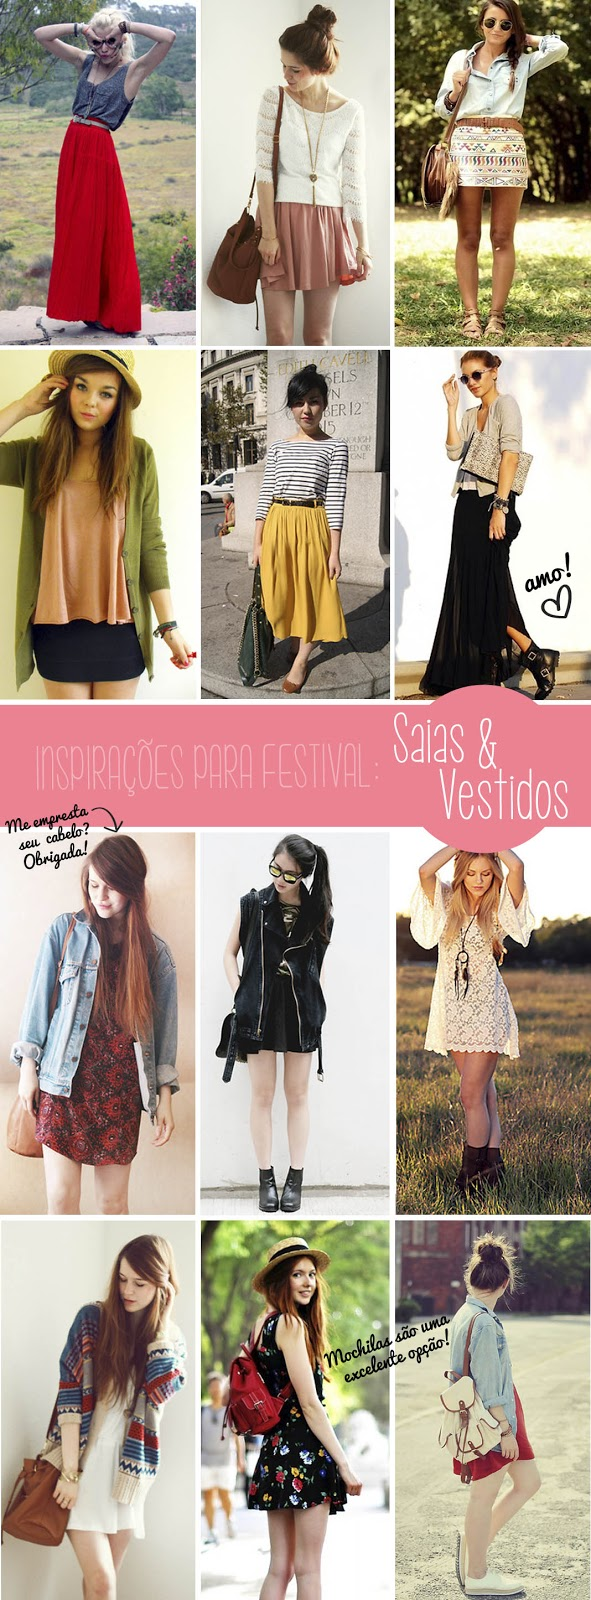 moda, estilo, festival, fashion, chapéu, crepper, bota, coturno, sapatilha, rasteira